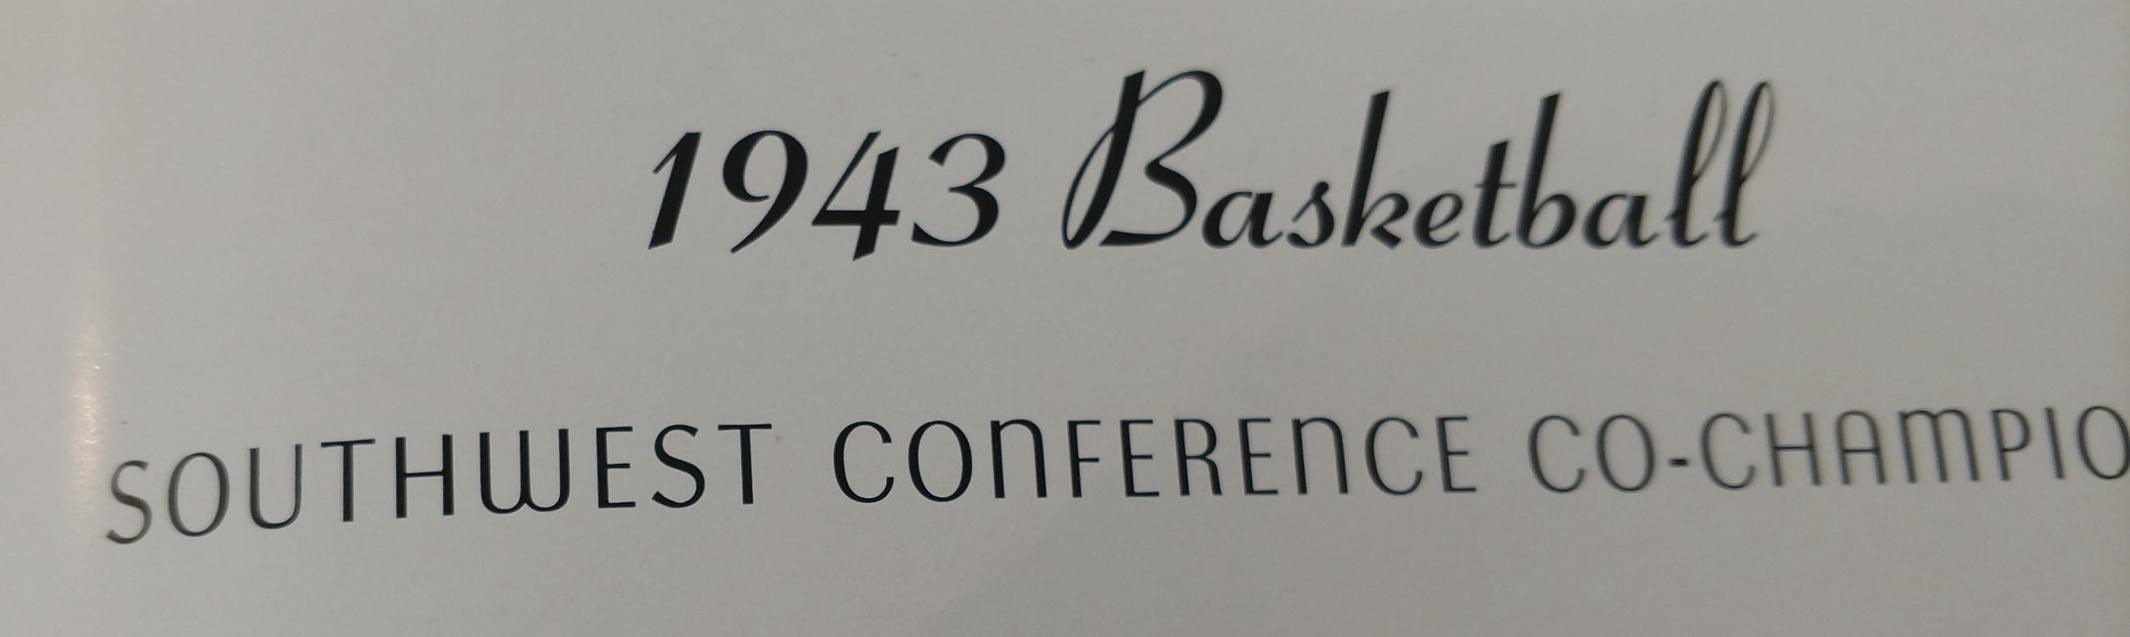 Basketball 1942-1943 (6).jpg